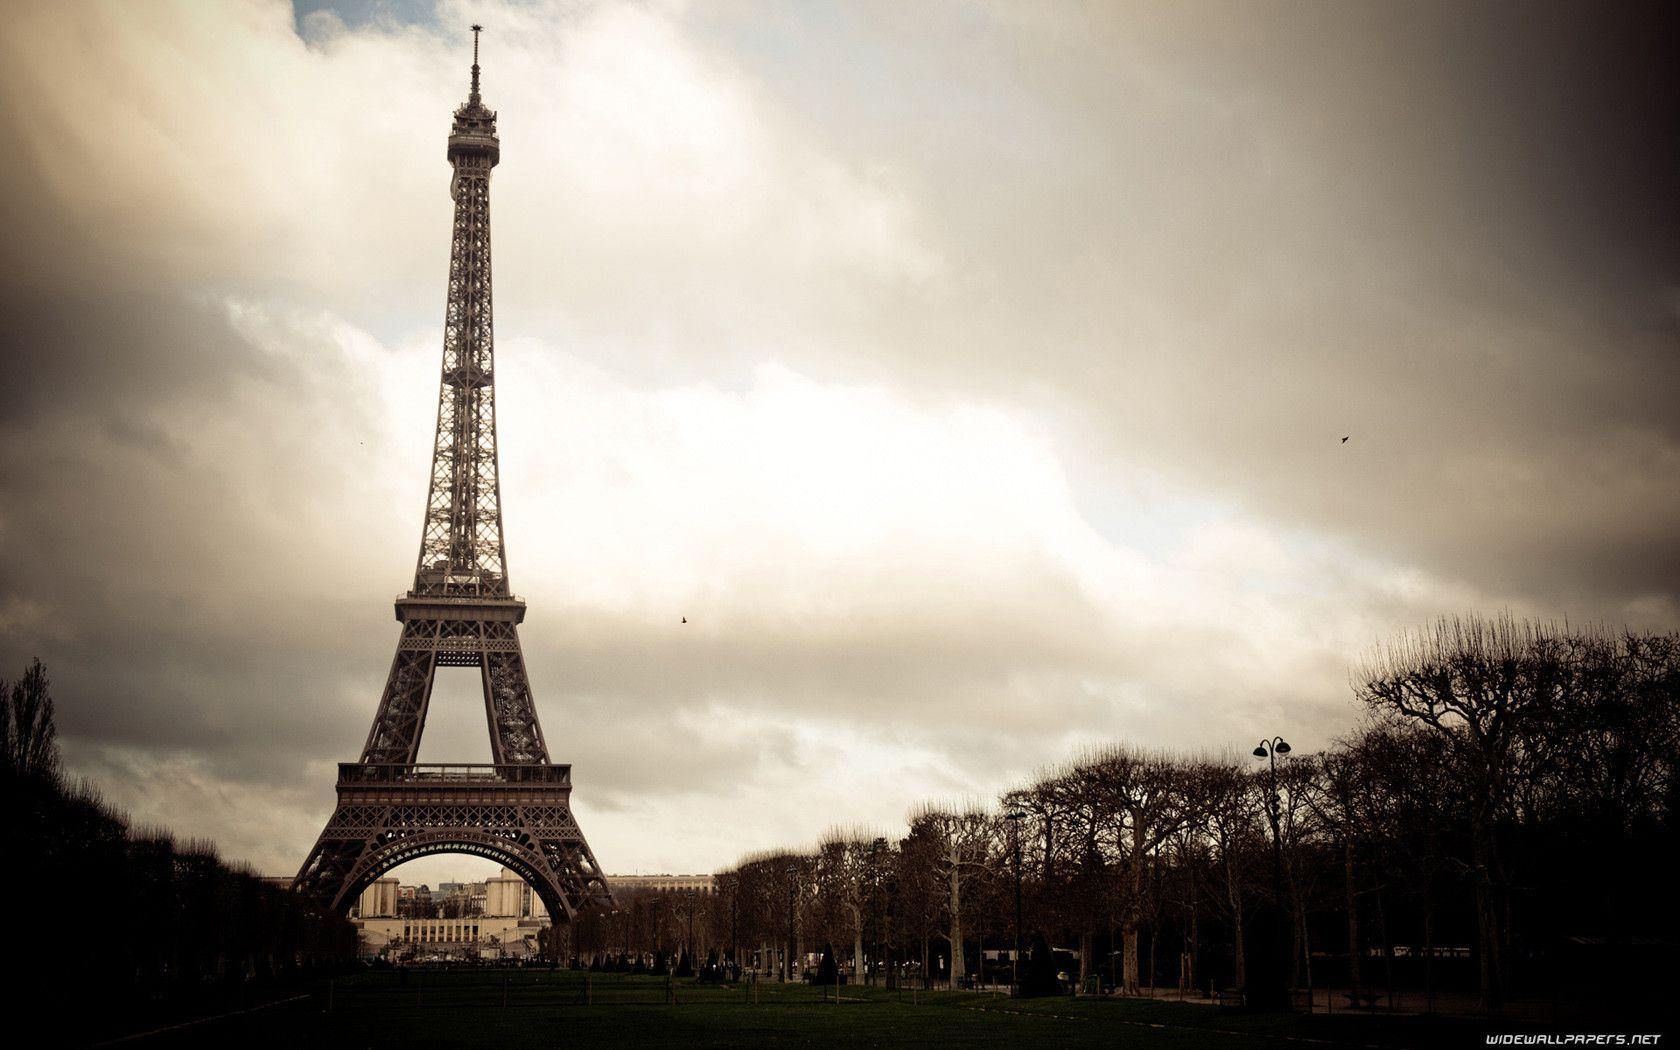 Vintage Paris Wallpaper Hd 1366x768 Wallpaper Eiffel Tower